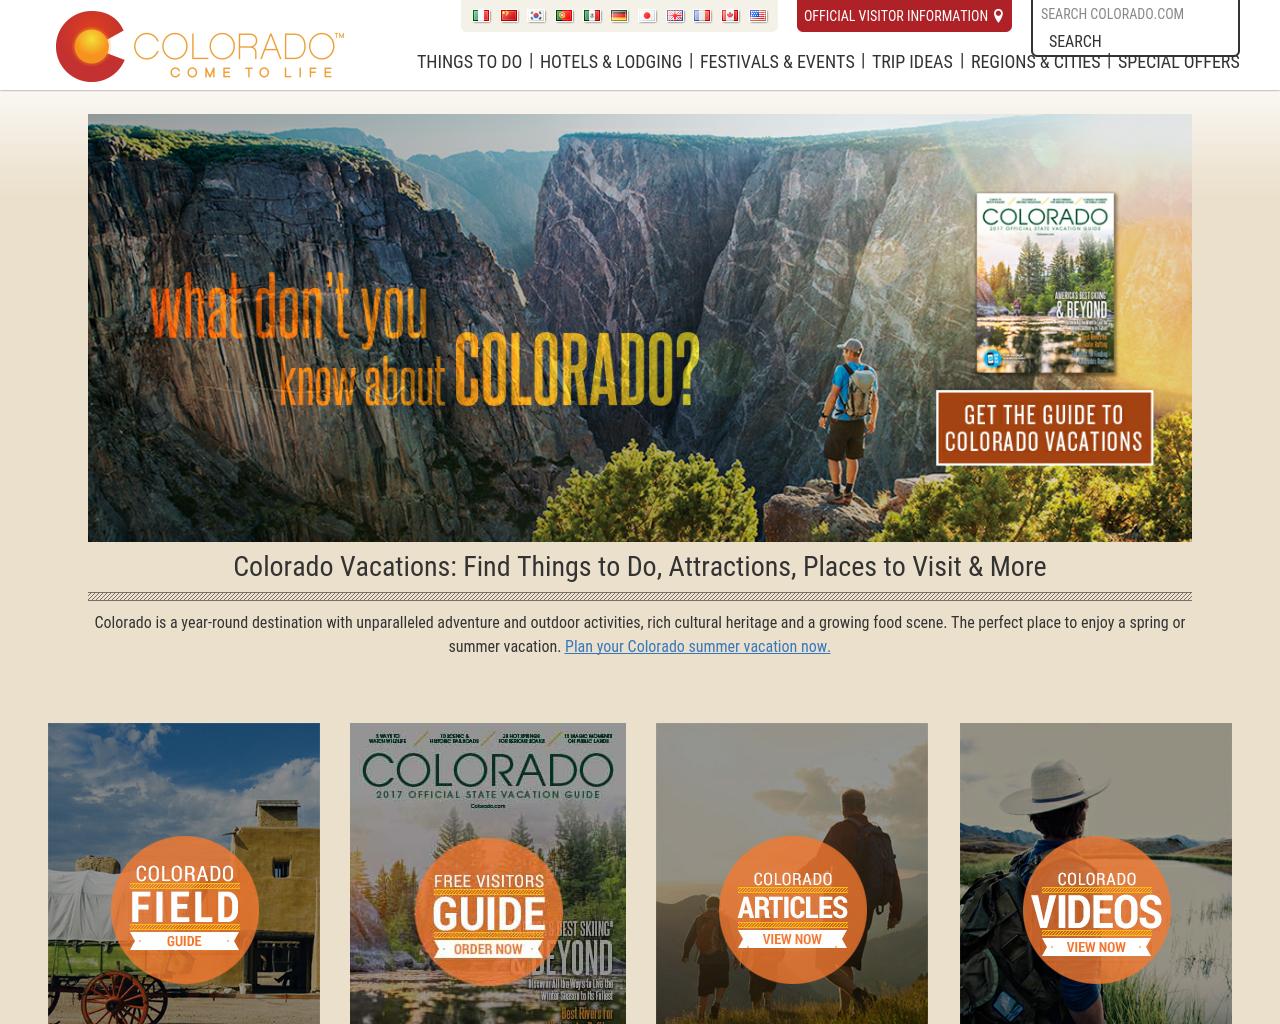 Colorado-Advertising-Reviews-Pricing